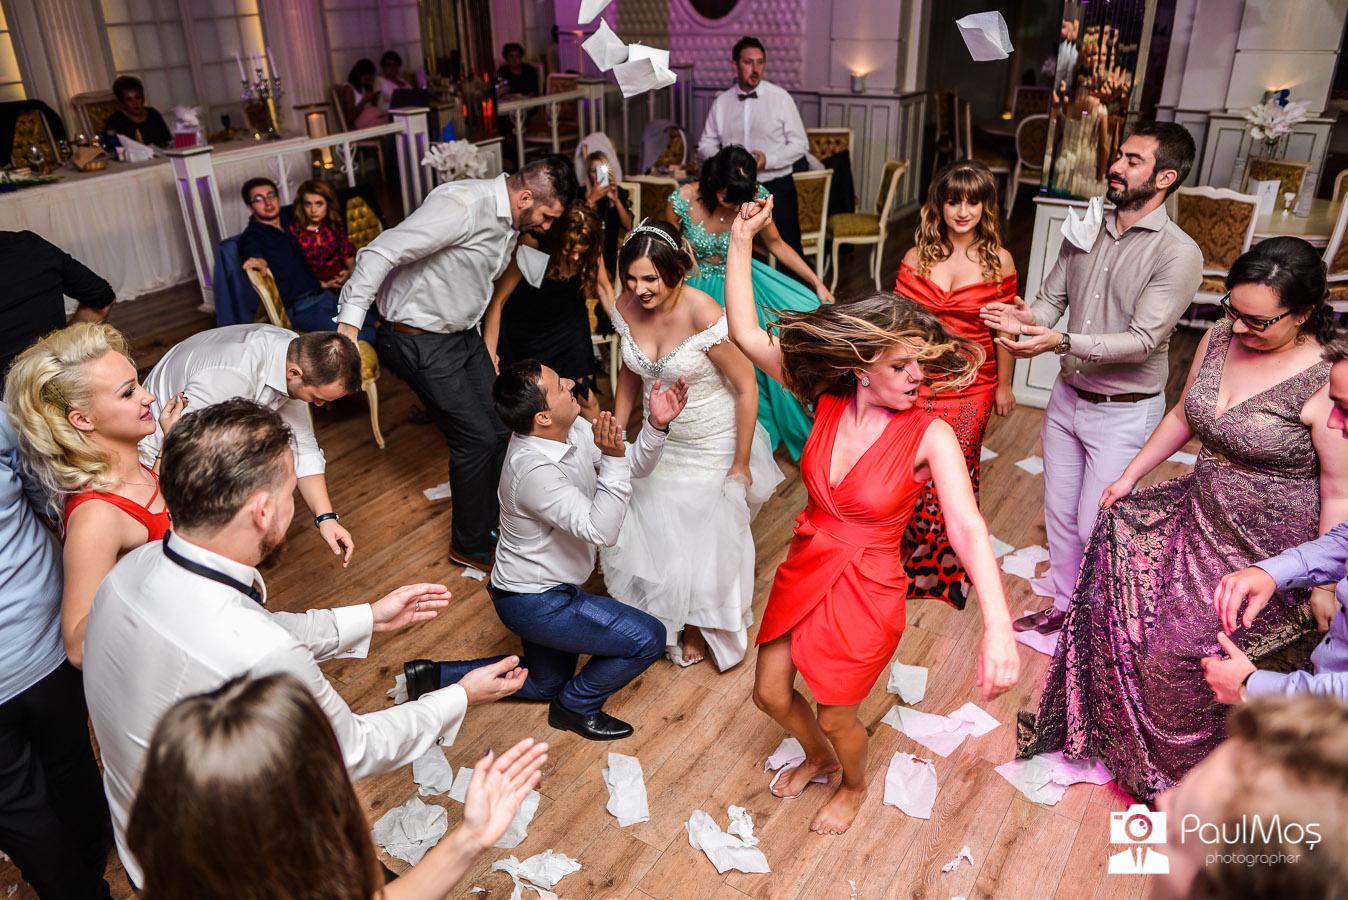 Fotograf nunta arad, paul mos fotograf, fotograf profesionist de nunti, foto-video, servicii foto nunta